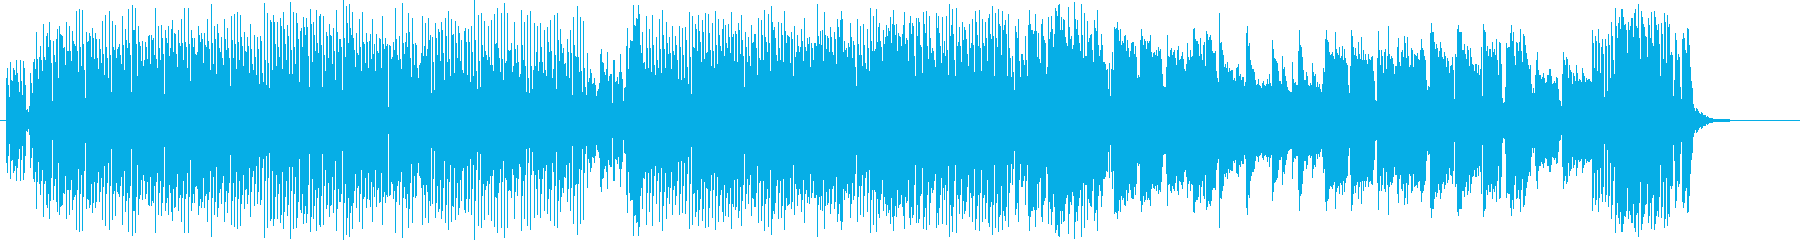 「kayumaiお姉さん」のそらの童謡曲の再生済みの波形